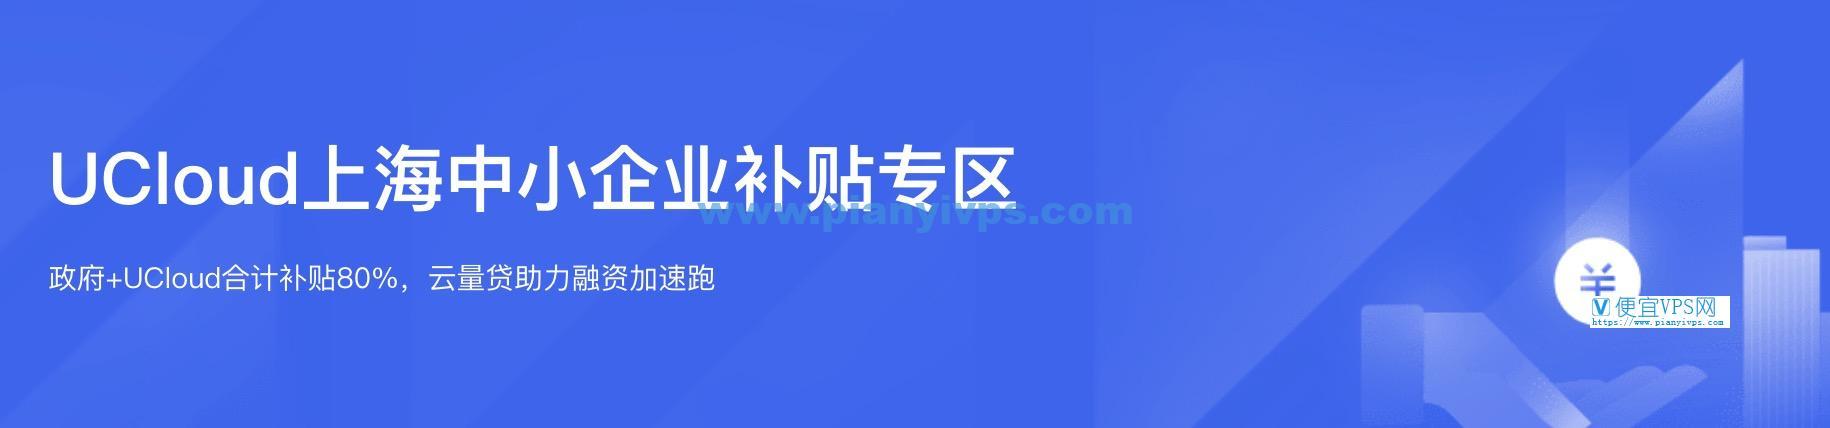 UCloud 上海中小企业补贴